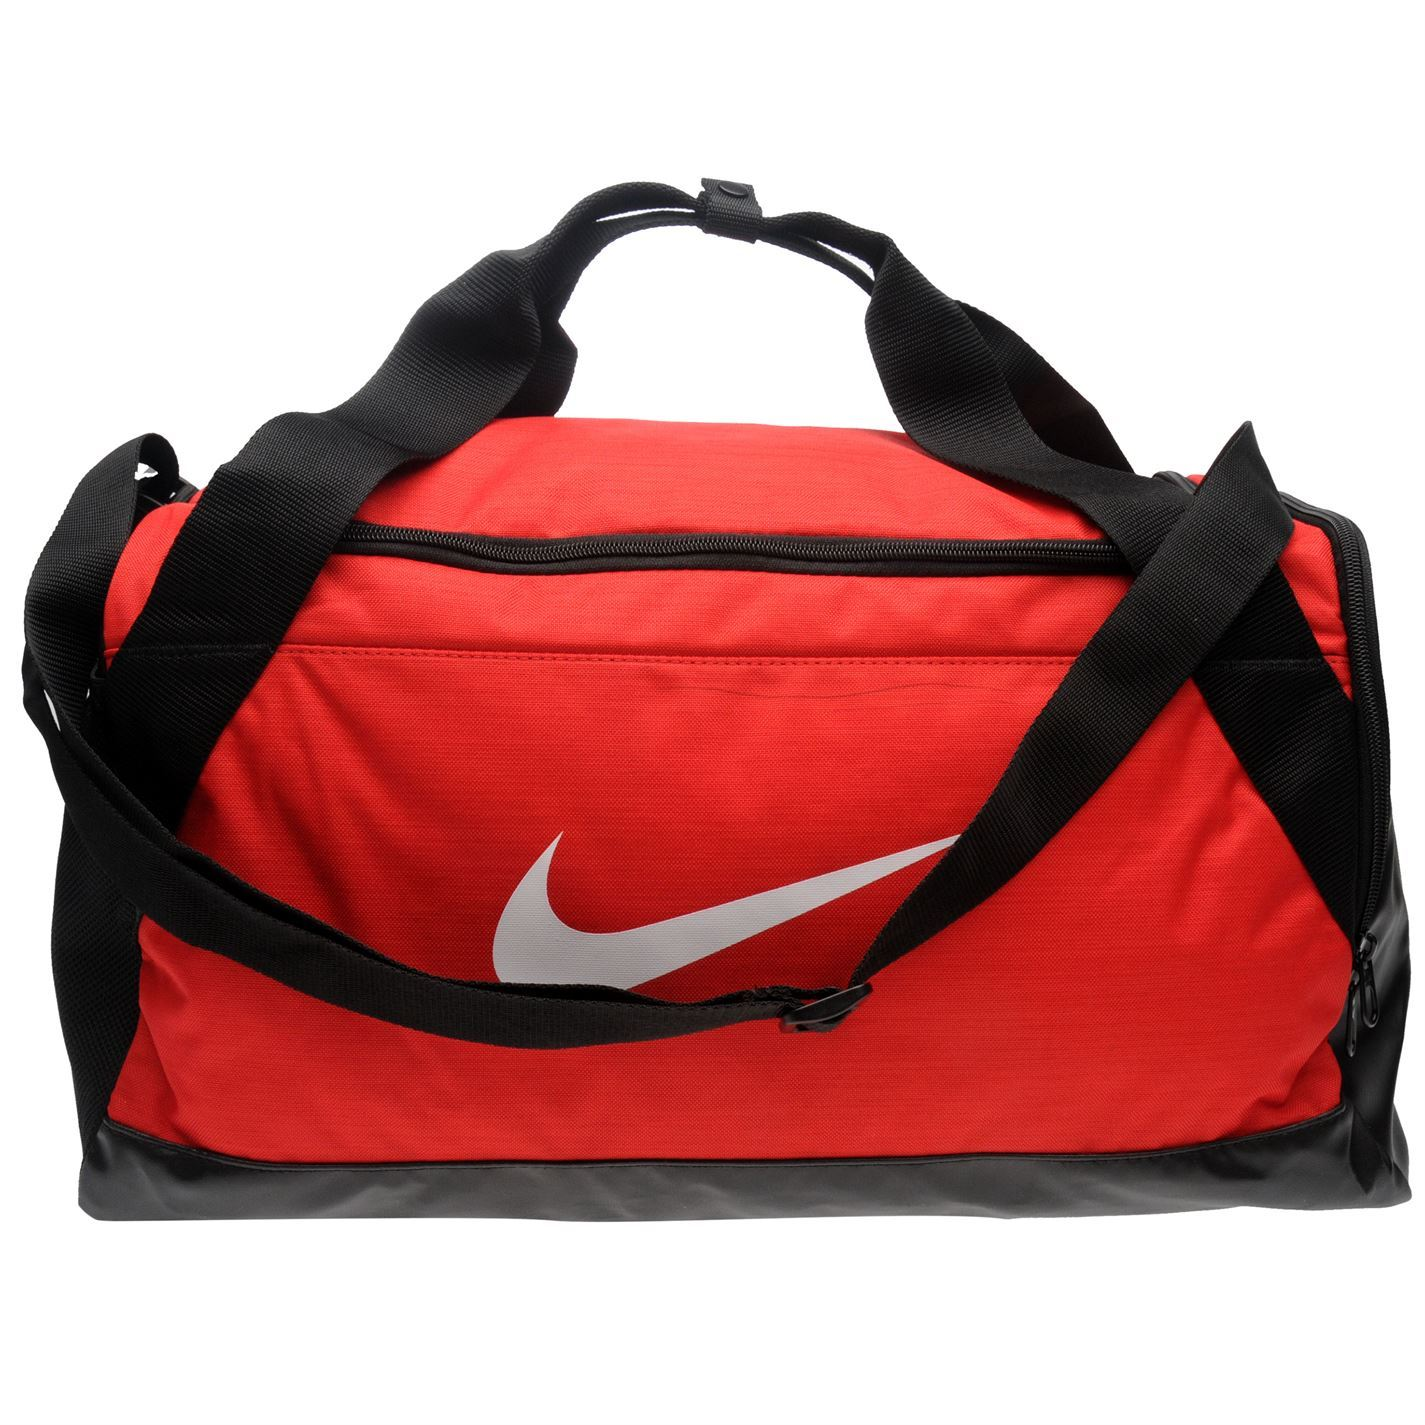 1085c896a7 ... Nike Brasilia petite poignée sport Holdall Gym rouge sac fourre-tout ...